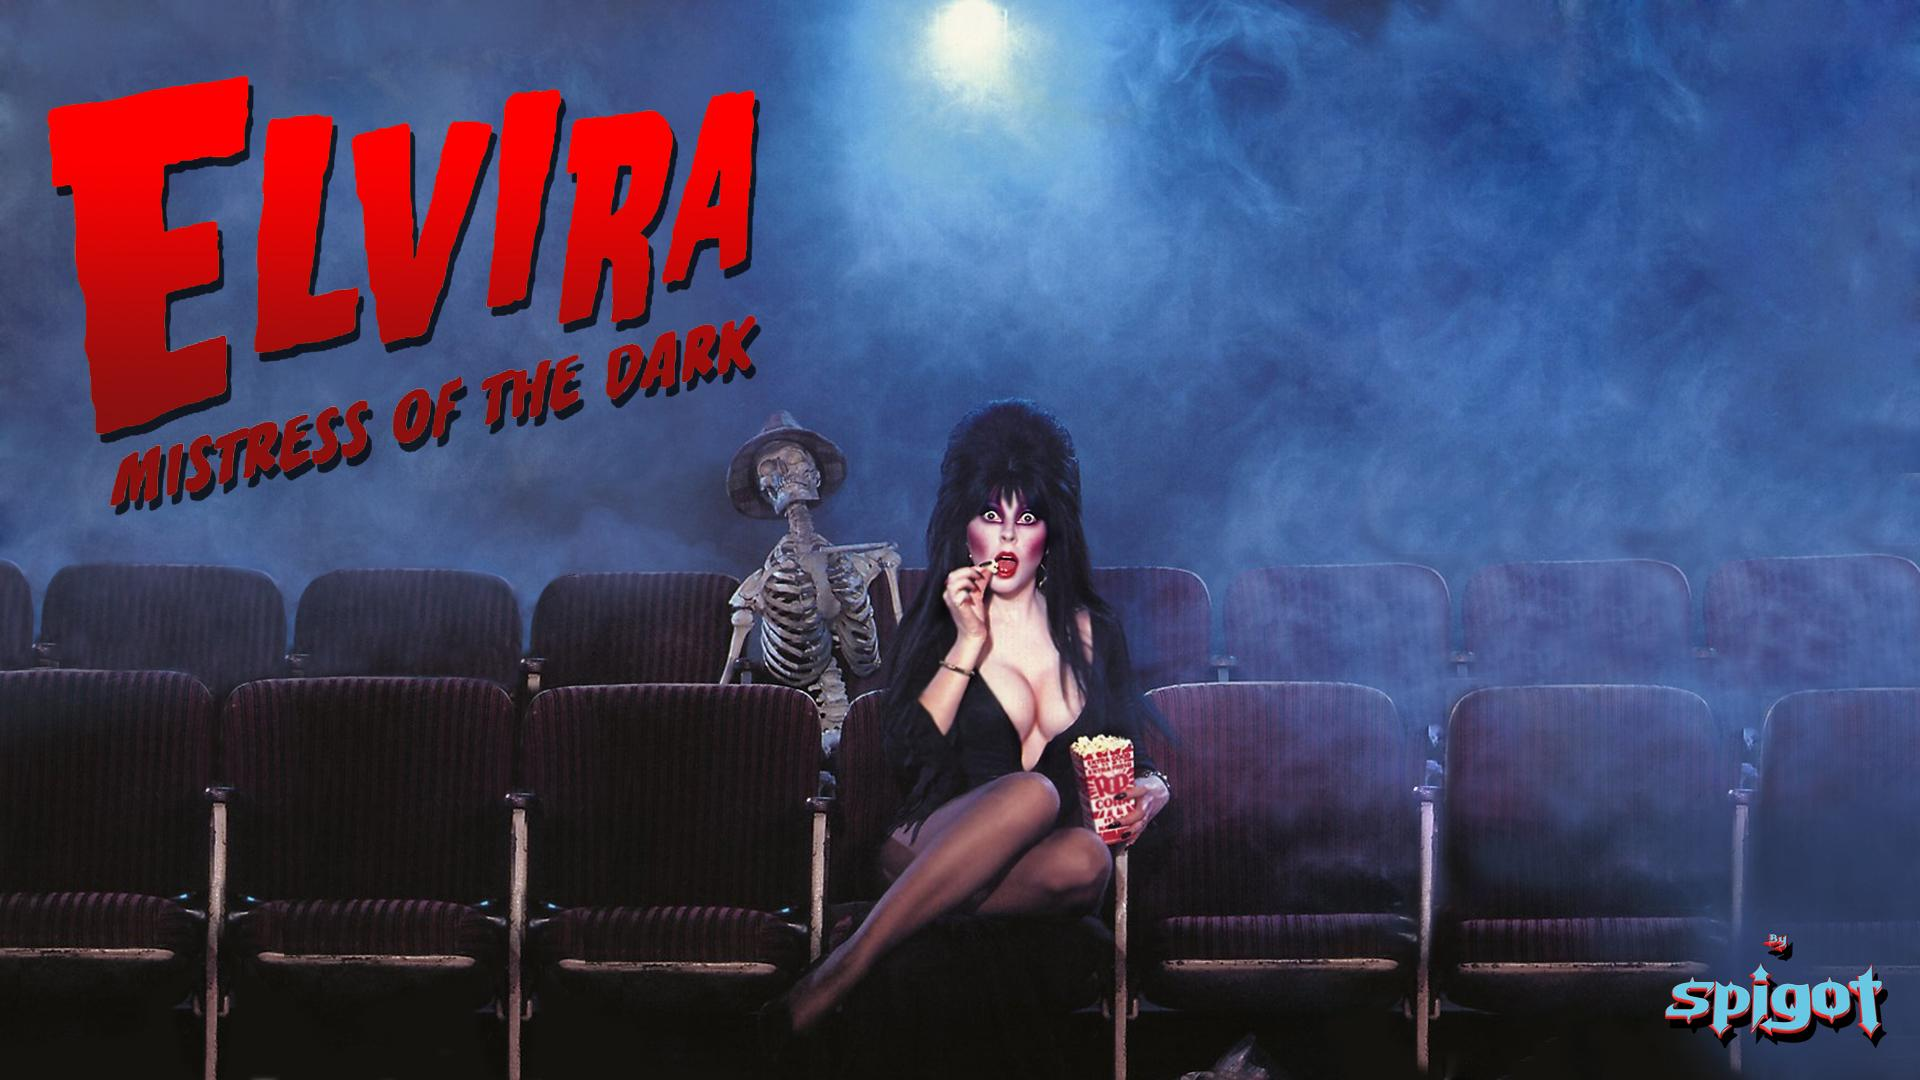 french-elvira-mistress-of-the-dark-scenes-lesbos-japanese